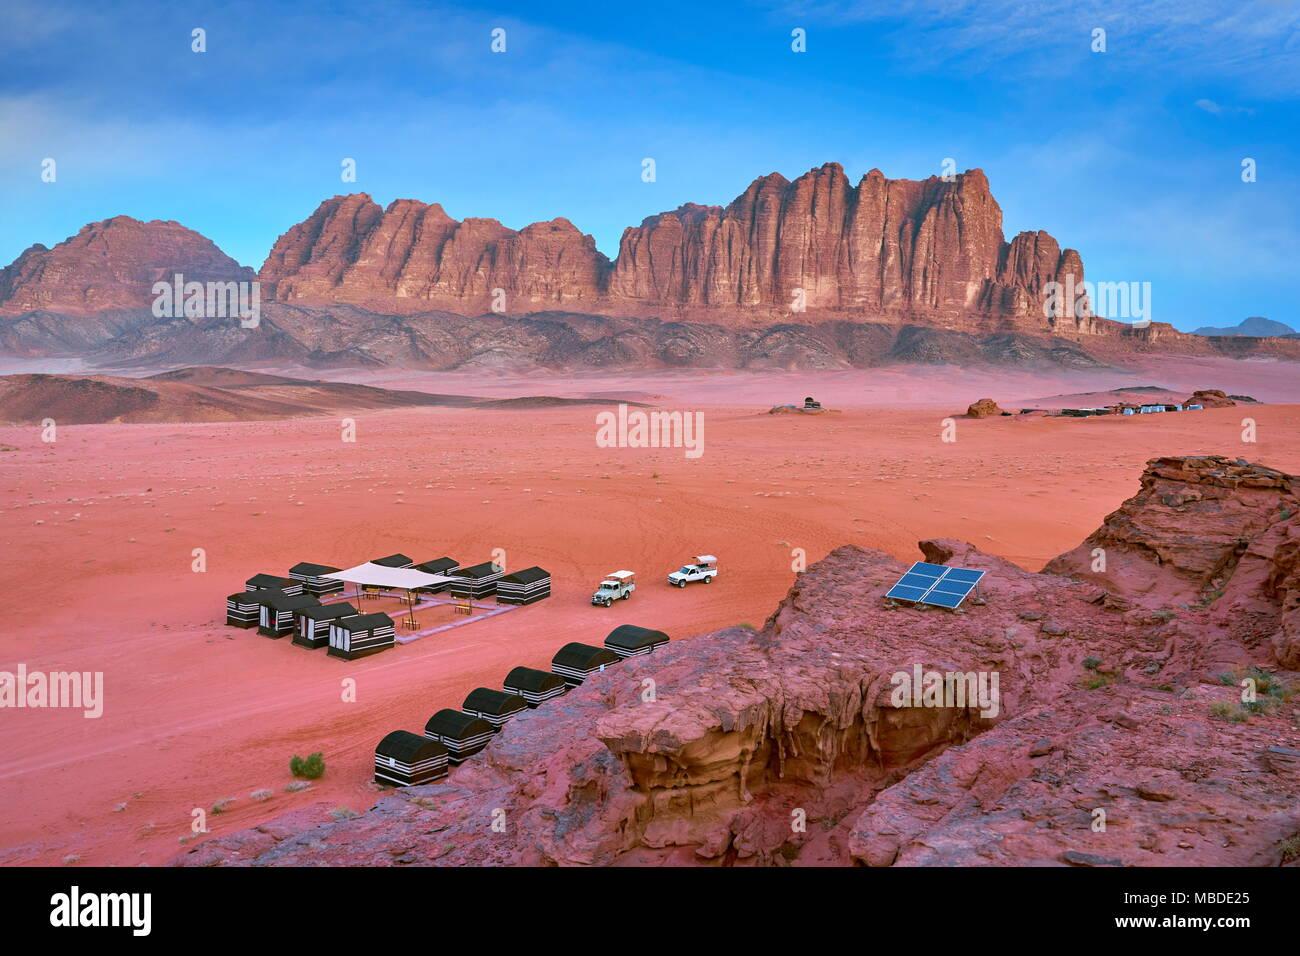 Beduinen Camp, Wadi Rum Wüste, Jordanien Stockbild